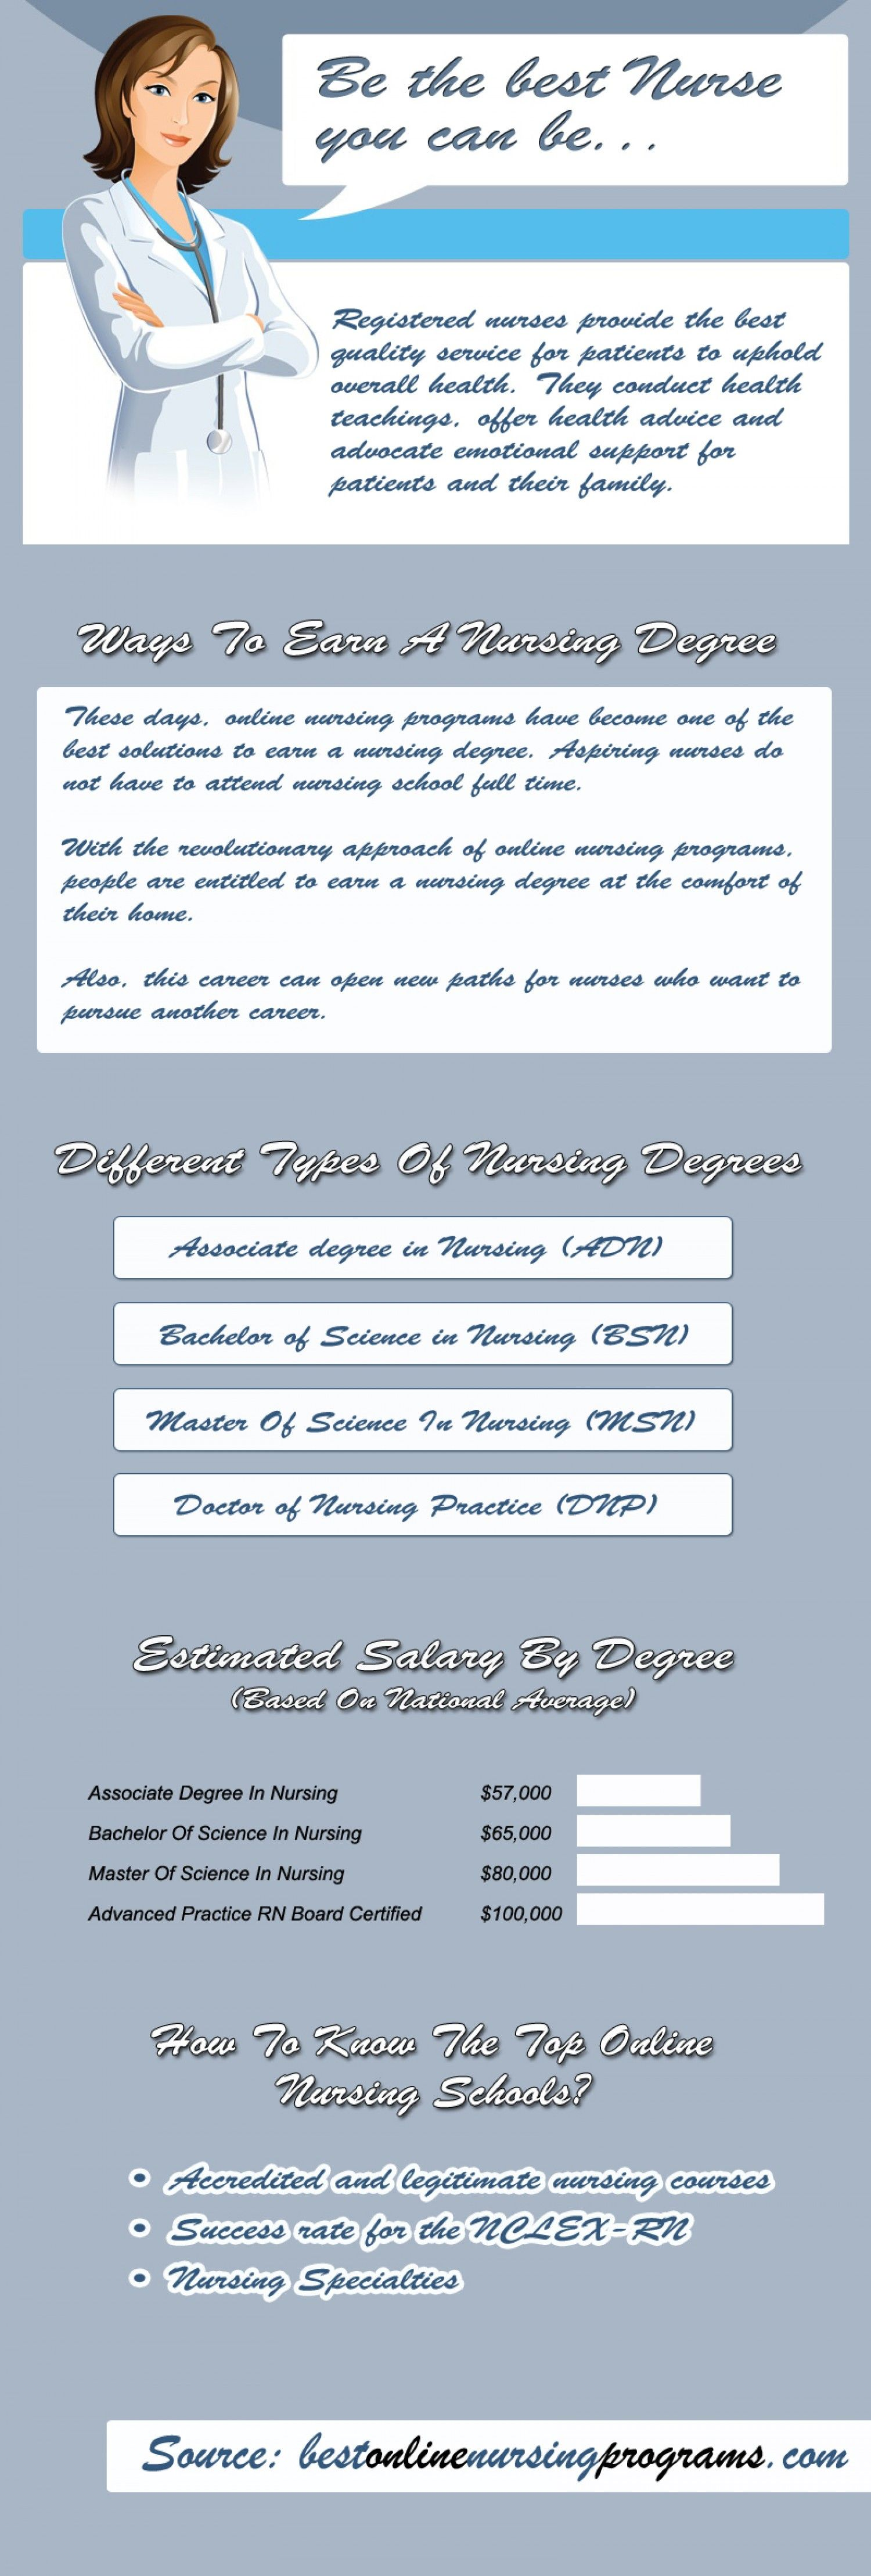 Different Types of Nursing Degrees Infographic | Pediatric & NICU ...